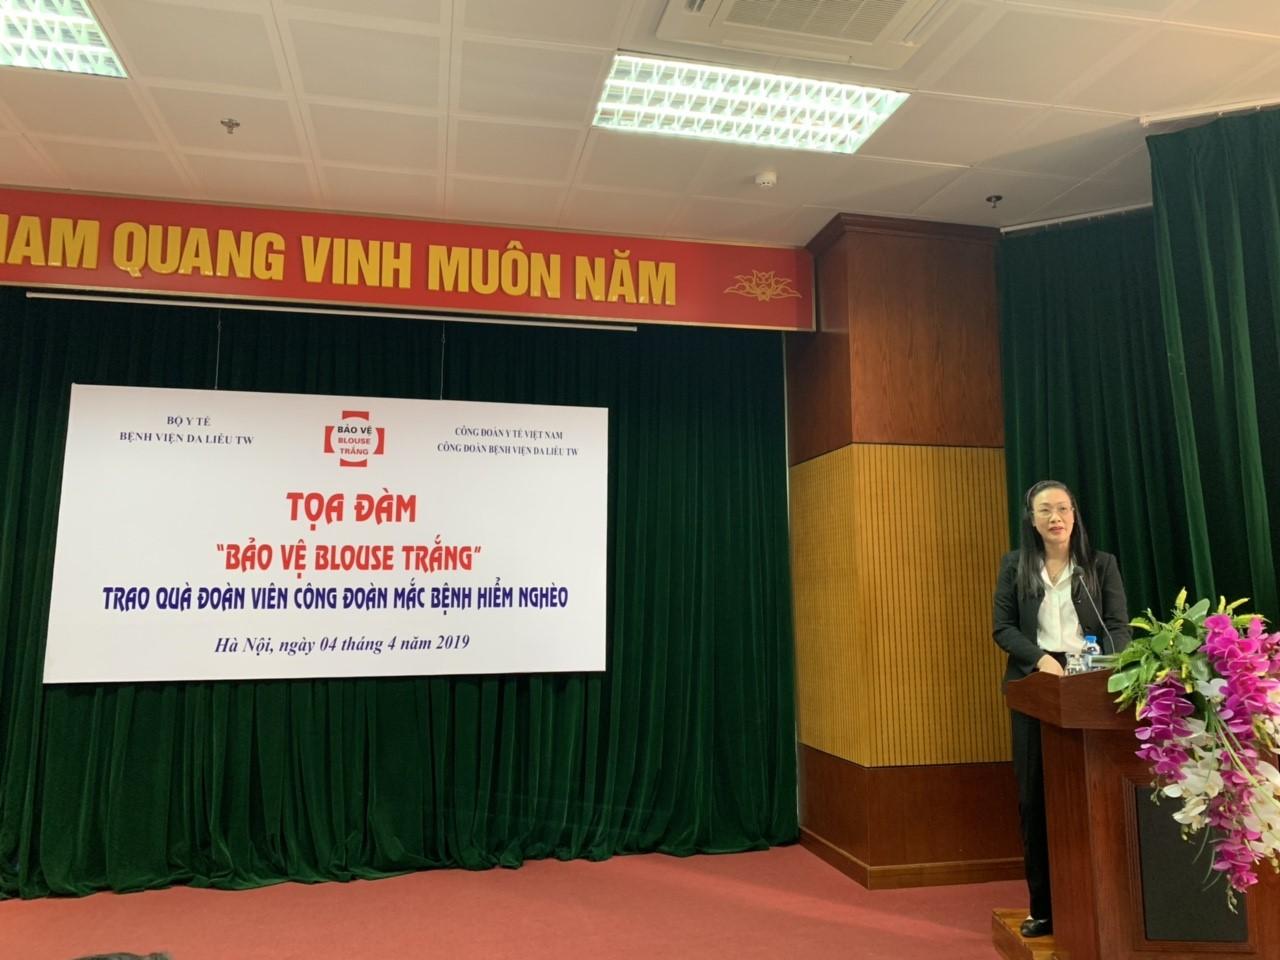 TopMan Dao tao 5S tai Benh vien Da lieu Trung uong 2 Tập huấn 5S cho Bệnh viện Da liễu Trung ương